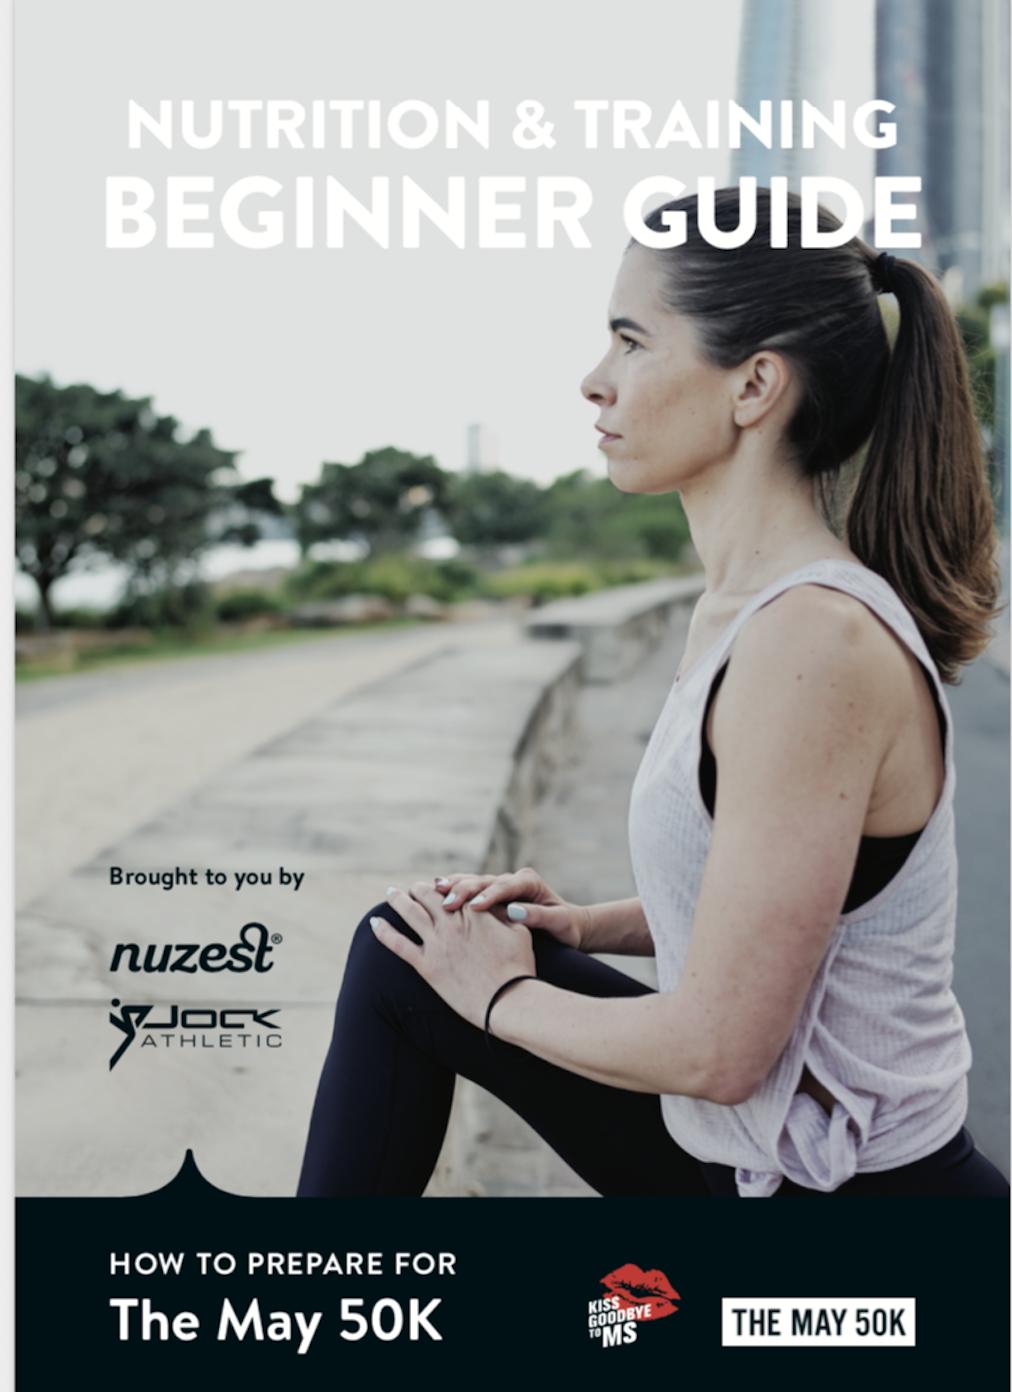 Nuzest's Nutrition & Training Guide – Beginner